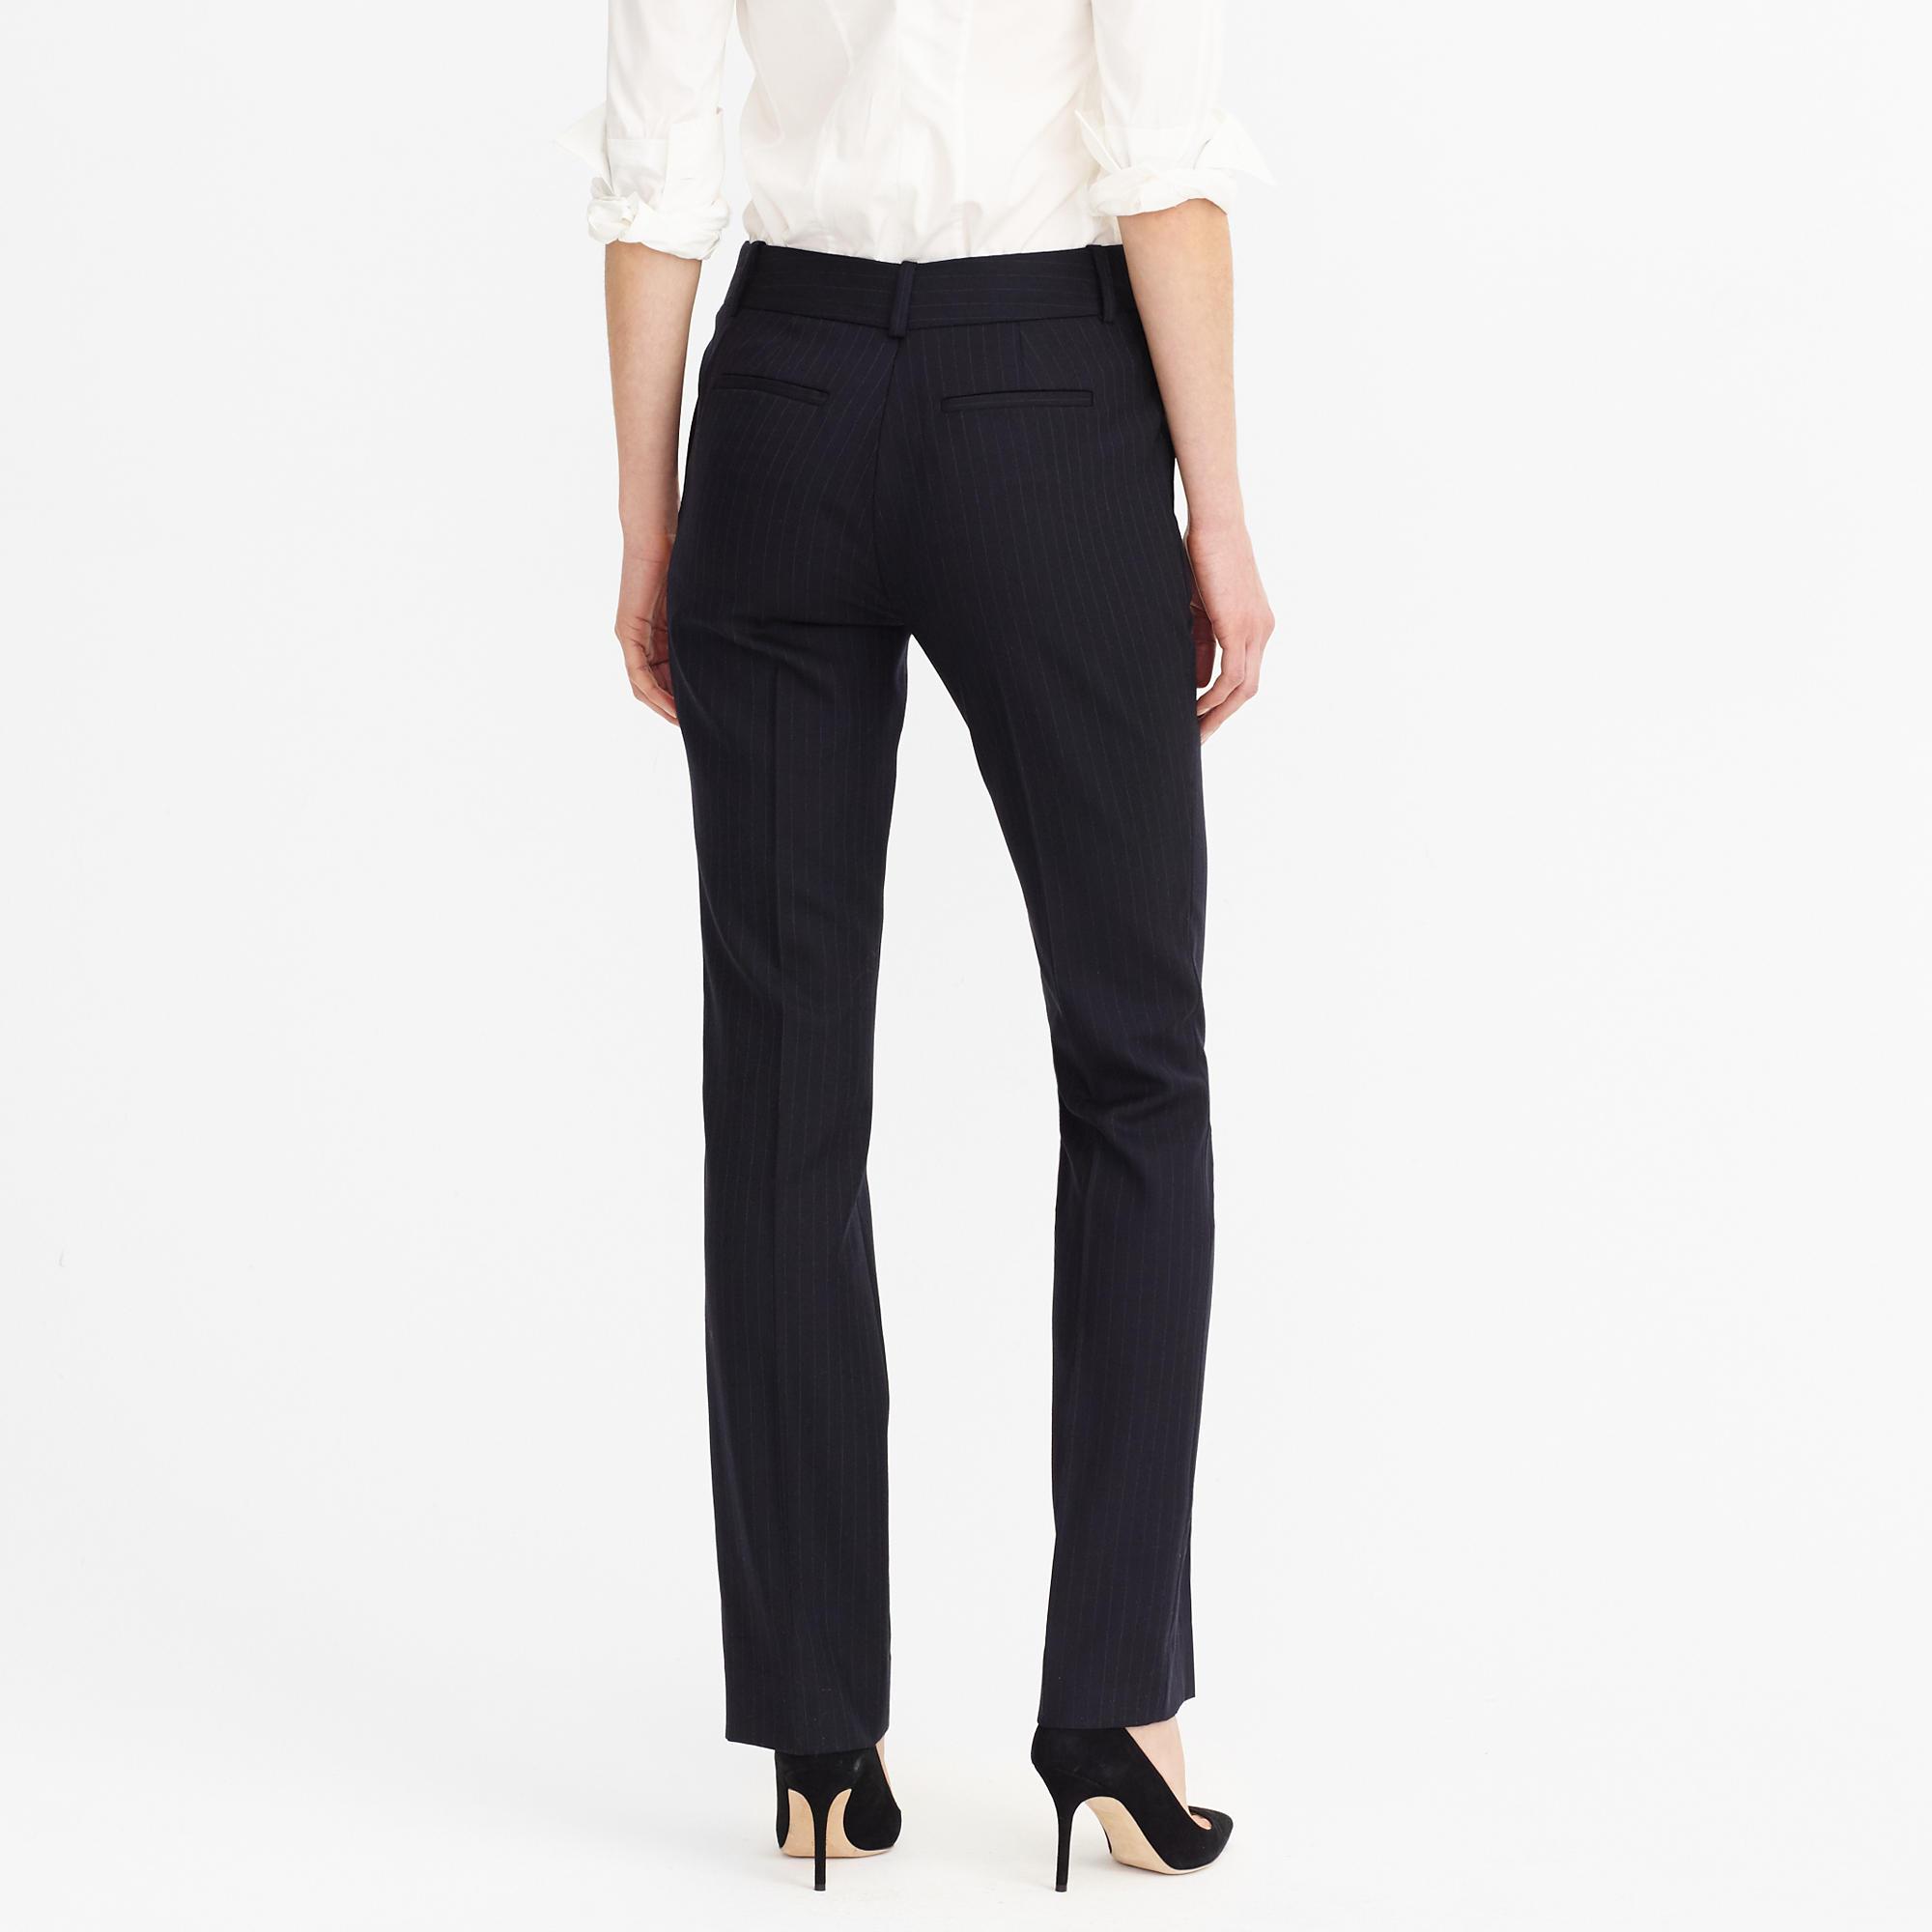 Skinny Leg Dress Pants Women